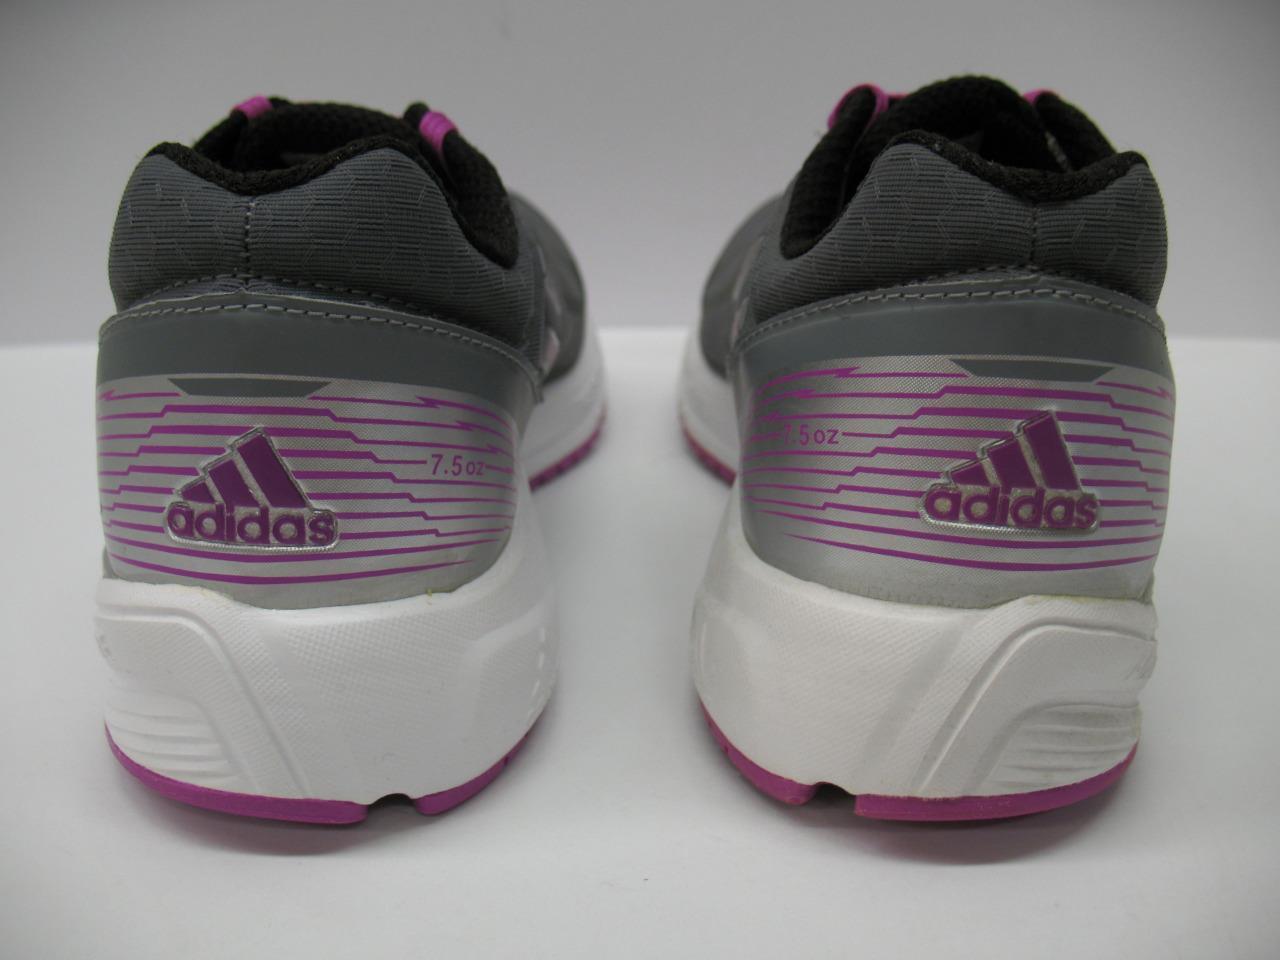 Adidas g66492 spider lite ausbildungsmaßnahmen schuhe turnschuhe turnschuhe turnschuhe gray rosa Damenss 7,5 a87813